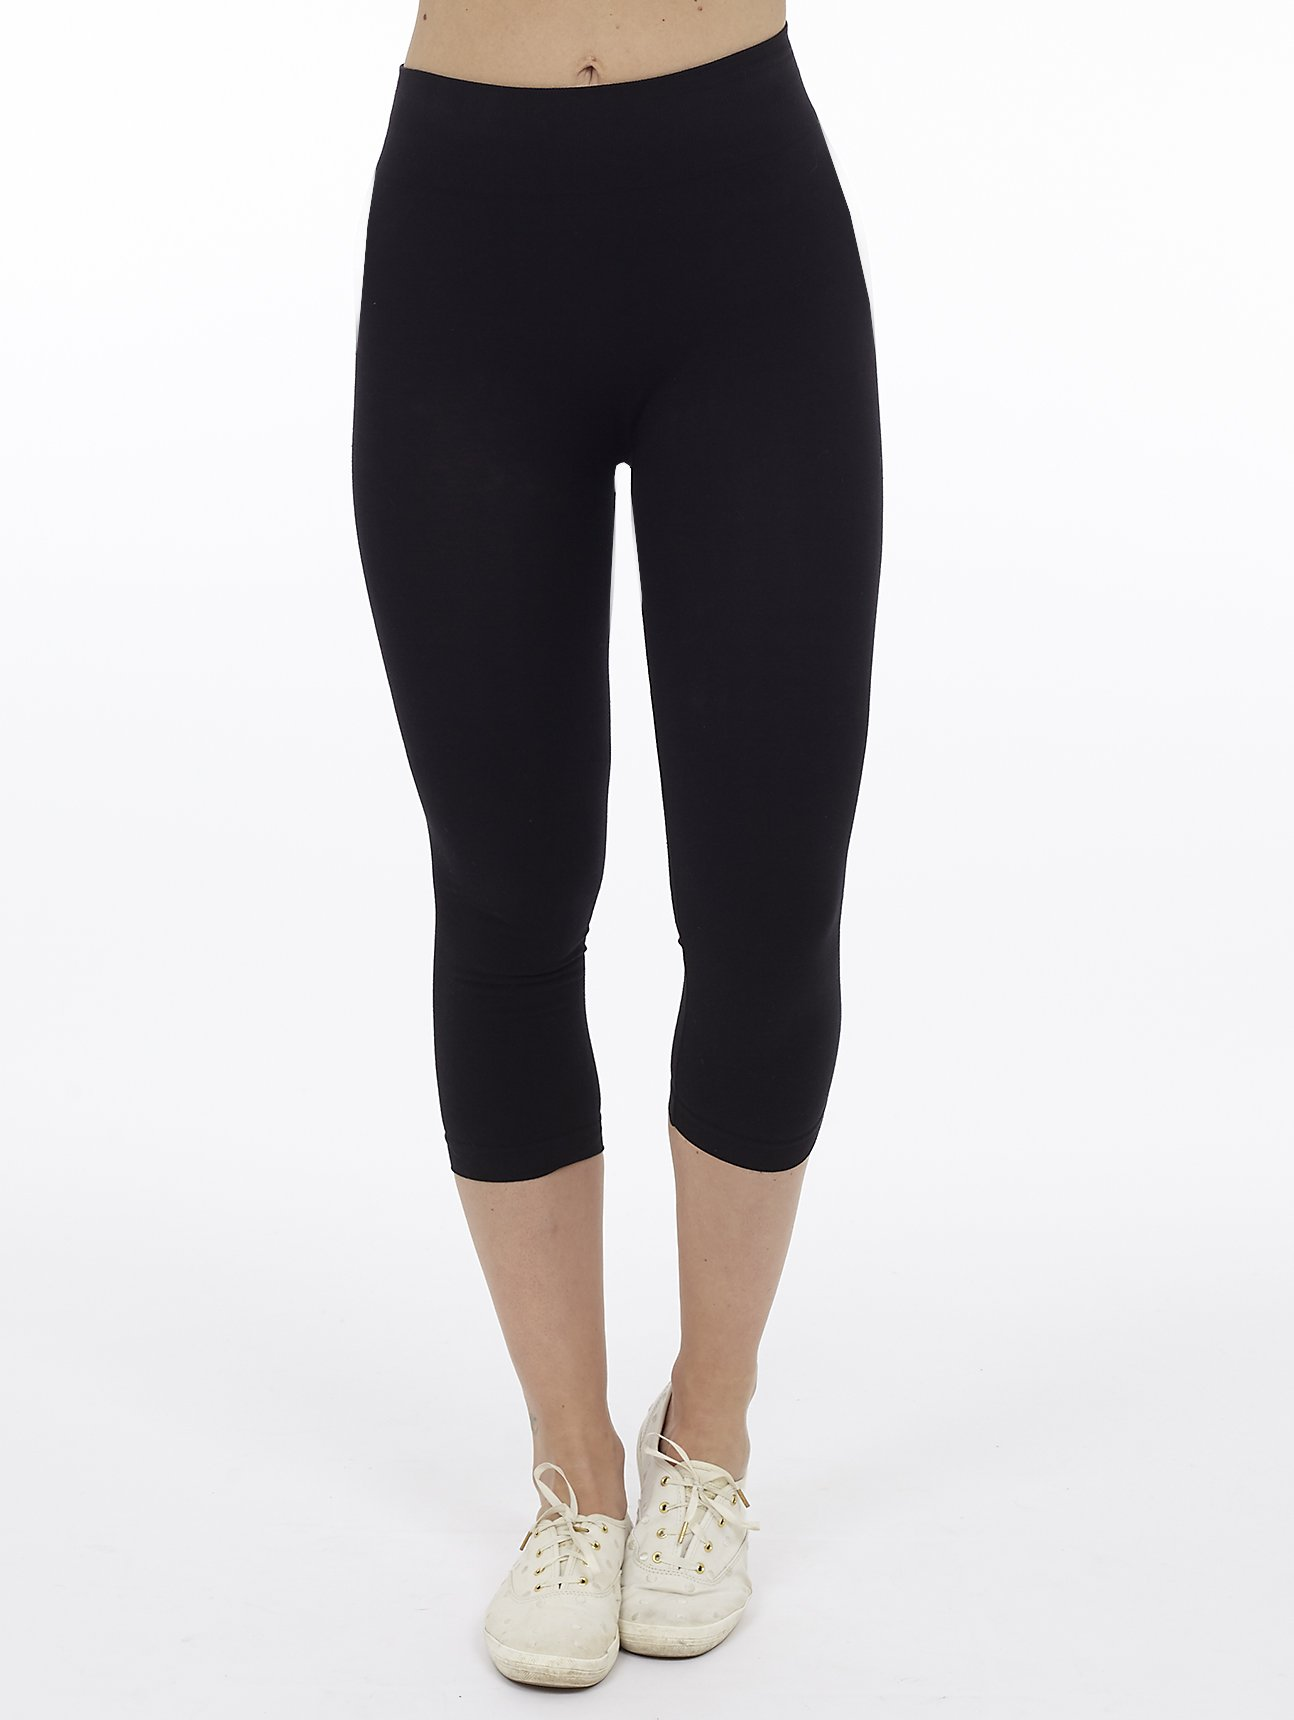 Cotton High Rise Capri length Legging